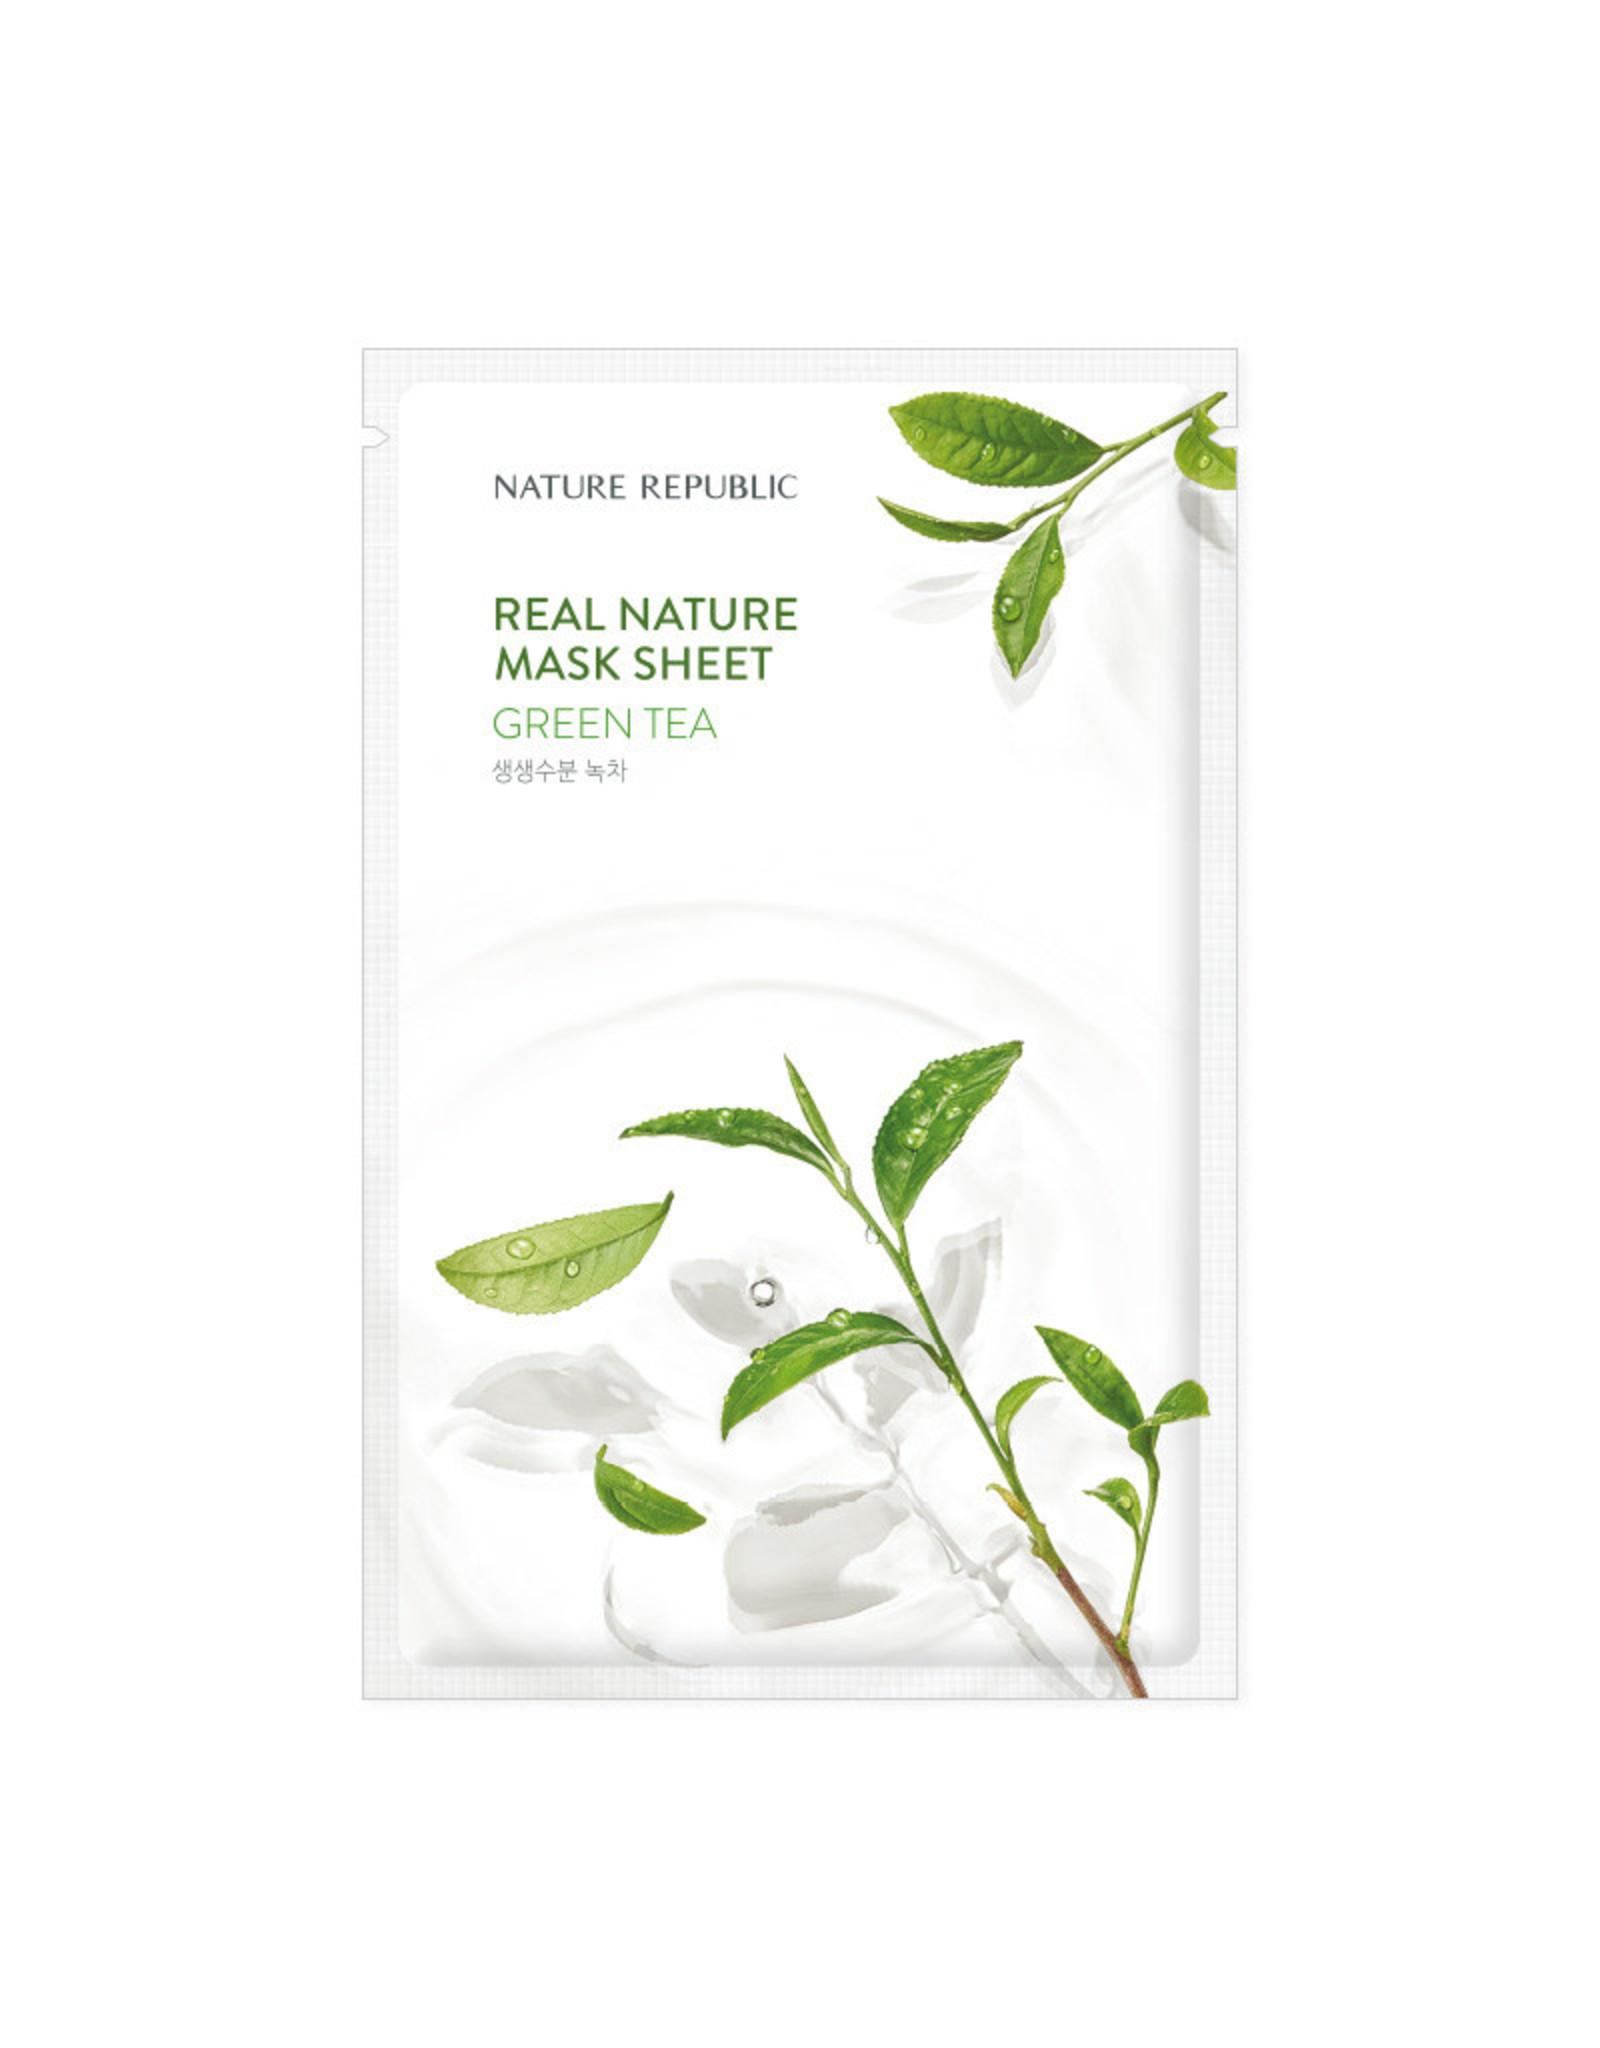 Real Nature Green Tea Mask Sheet (Orig $1.90)